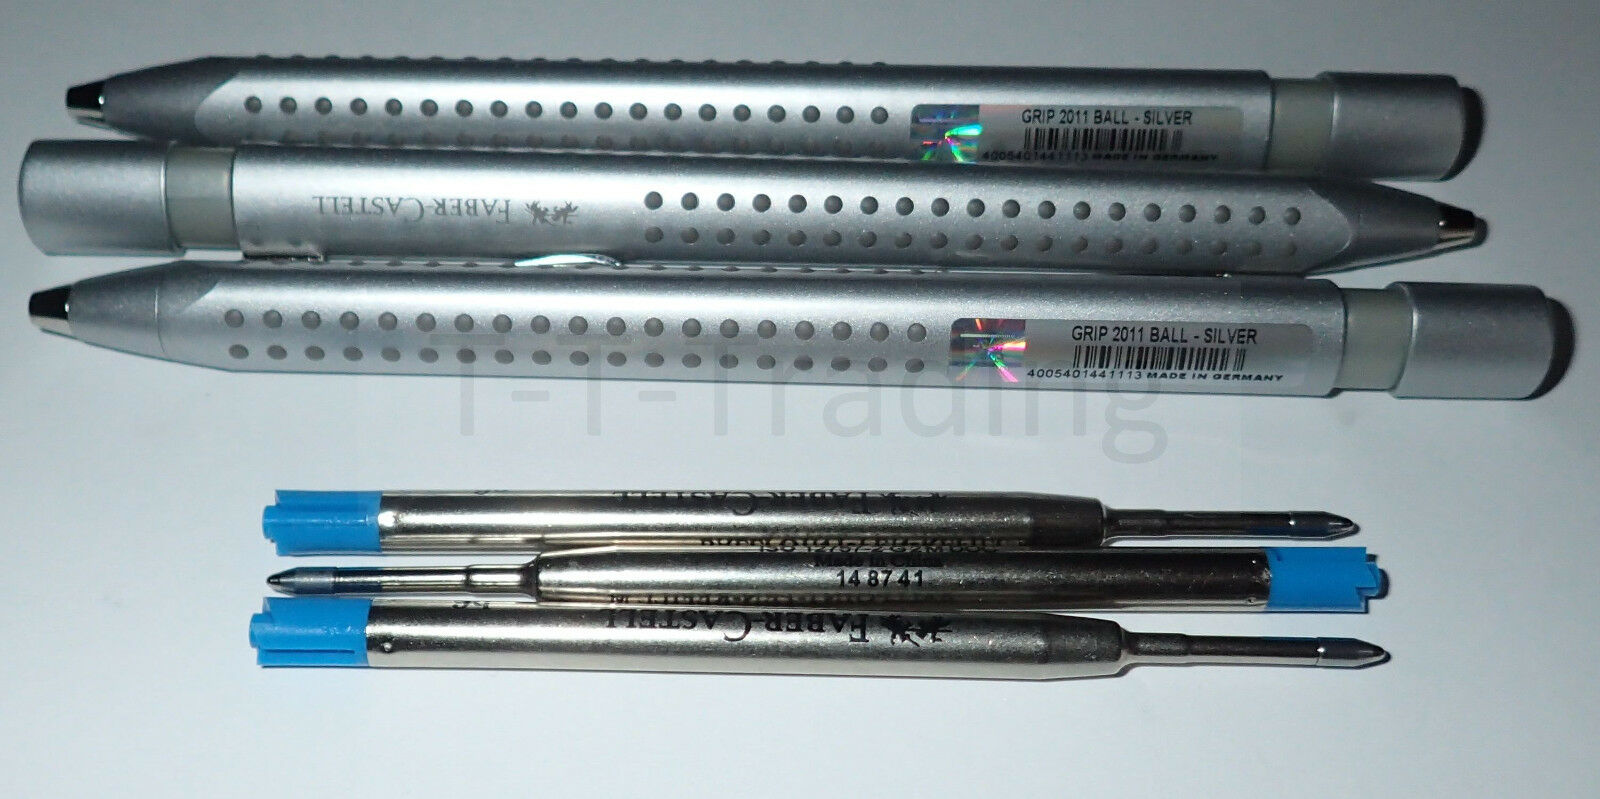 Faber Castell Kugelschreiber Kugelschreiber Kugelschreiber Grip 2011 silber, Nr. 144111 diverse Sparpakete | Sale Online  d17c90